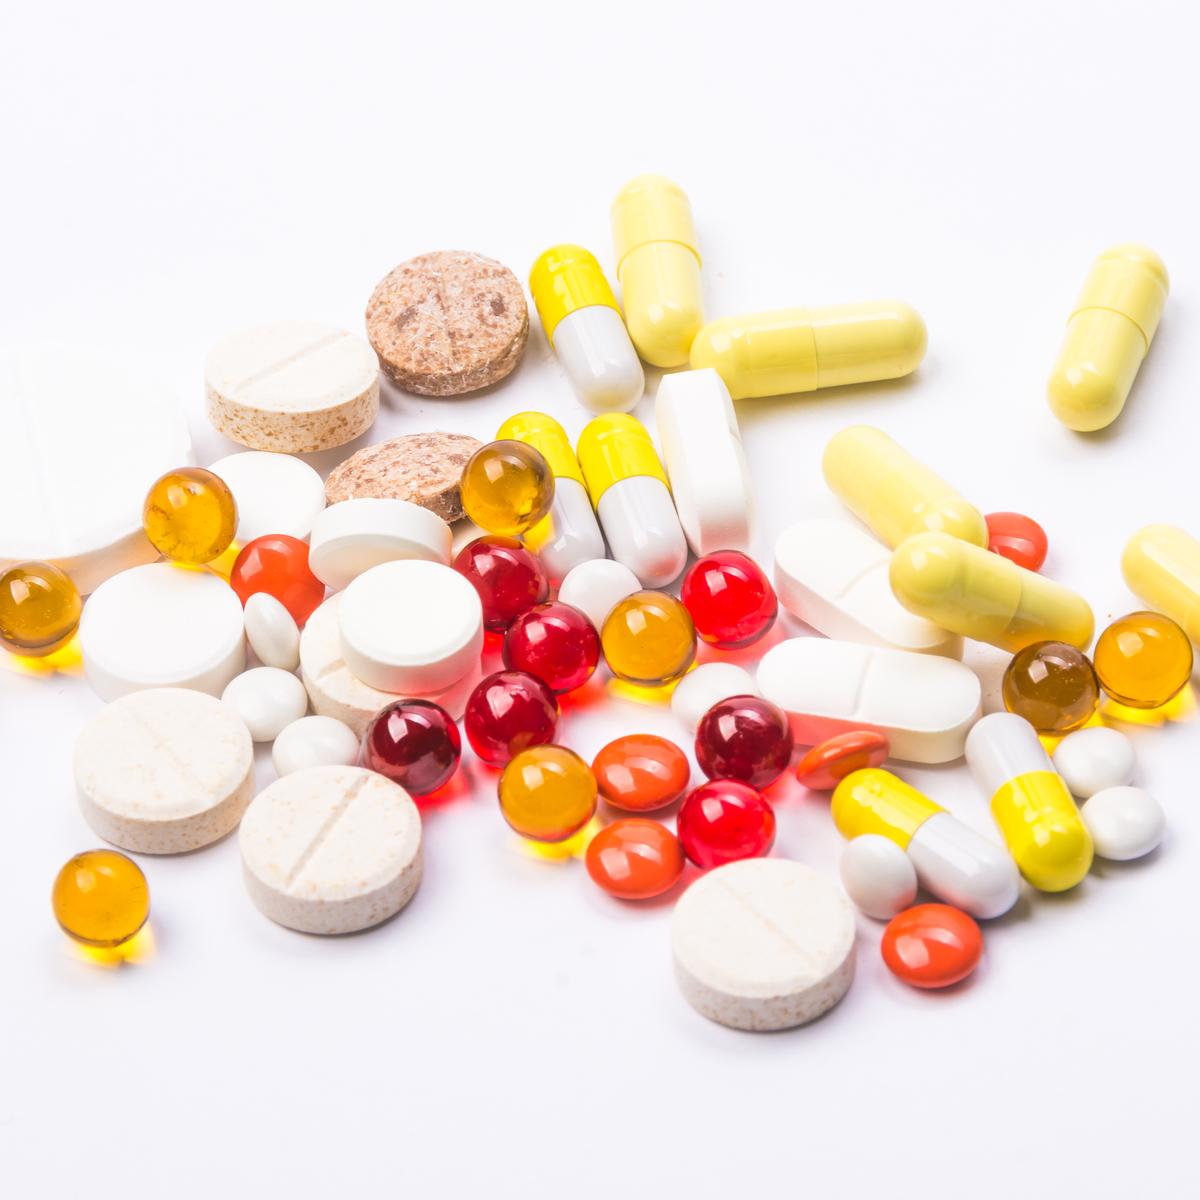 Food Supplements png-elitpharma